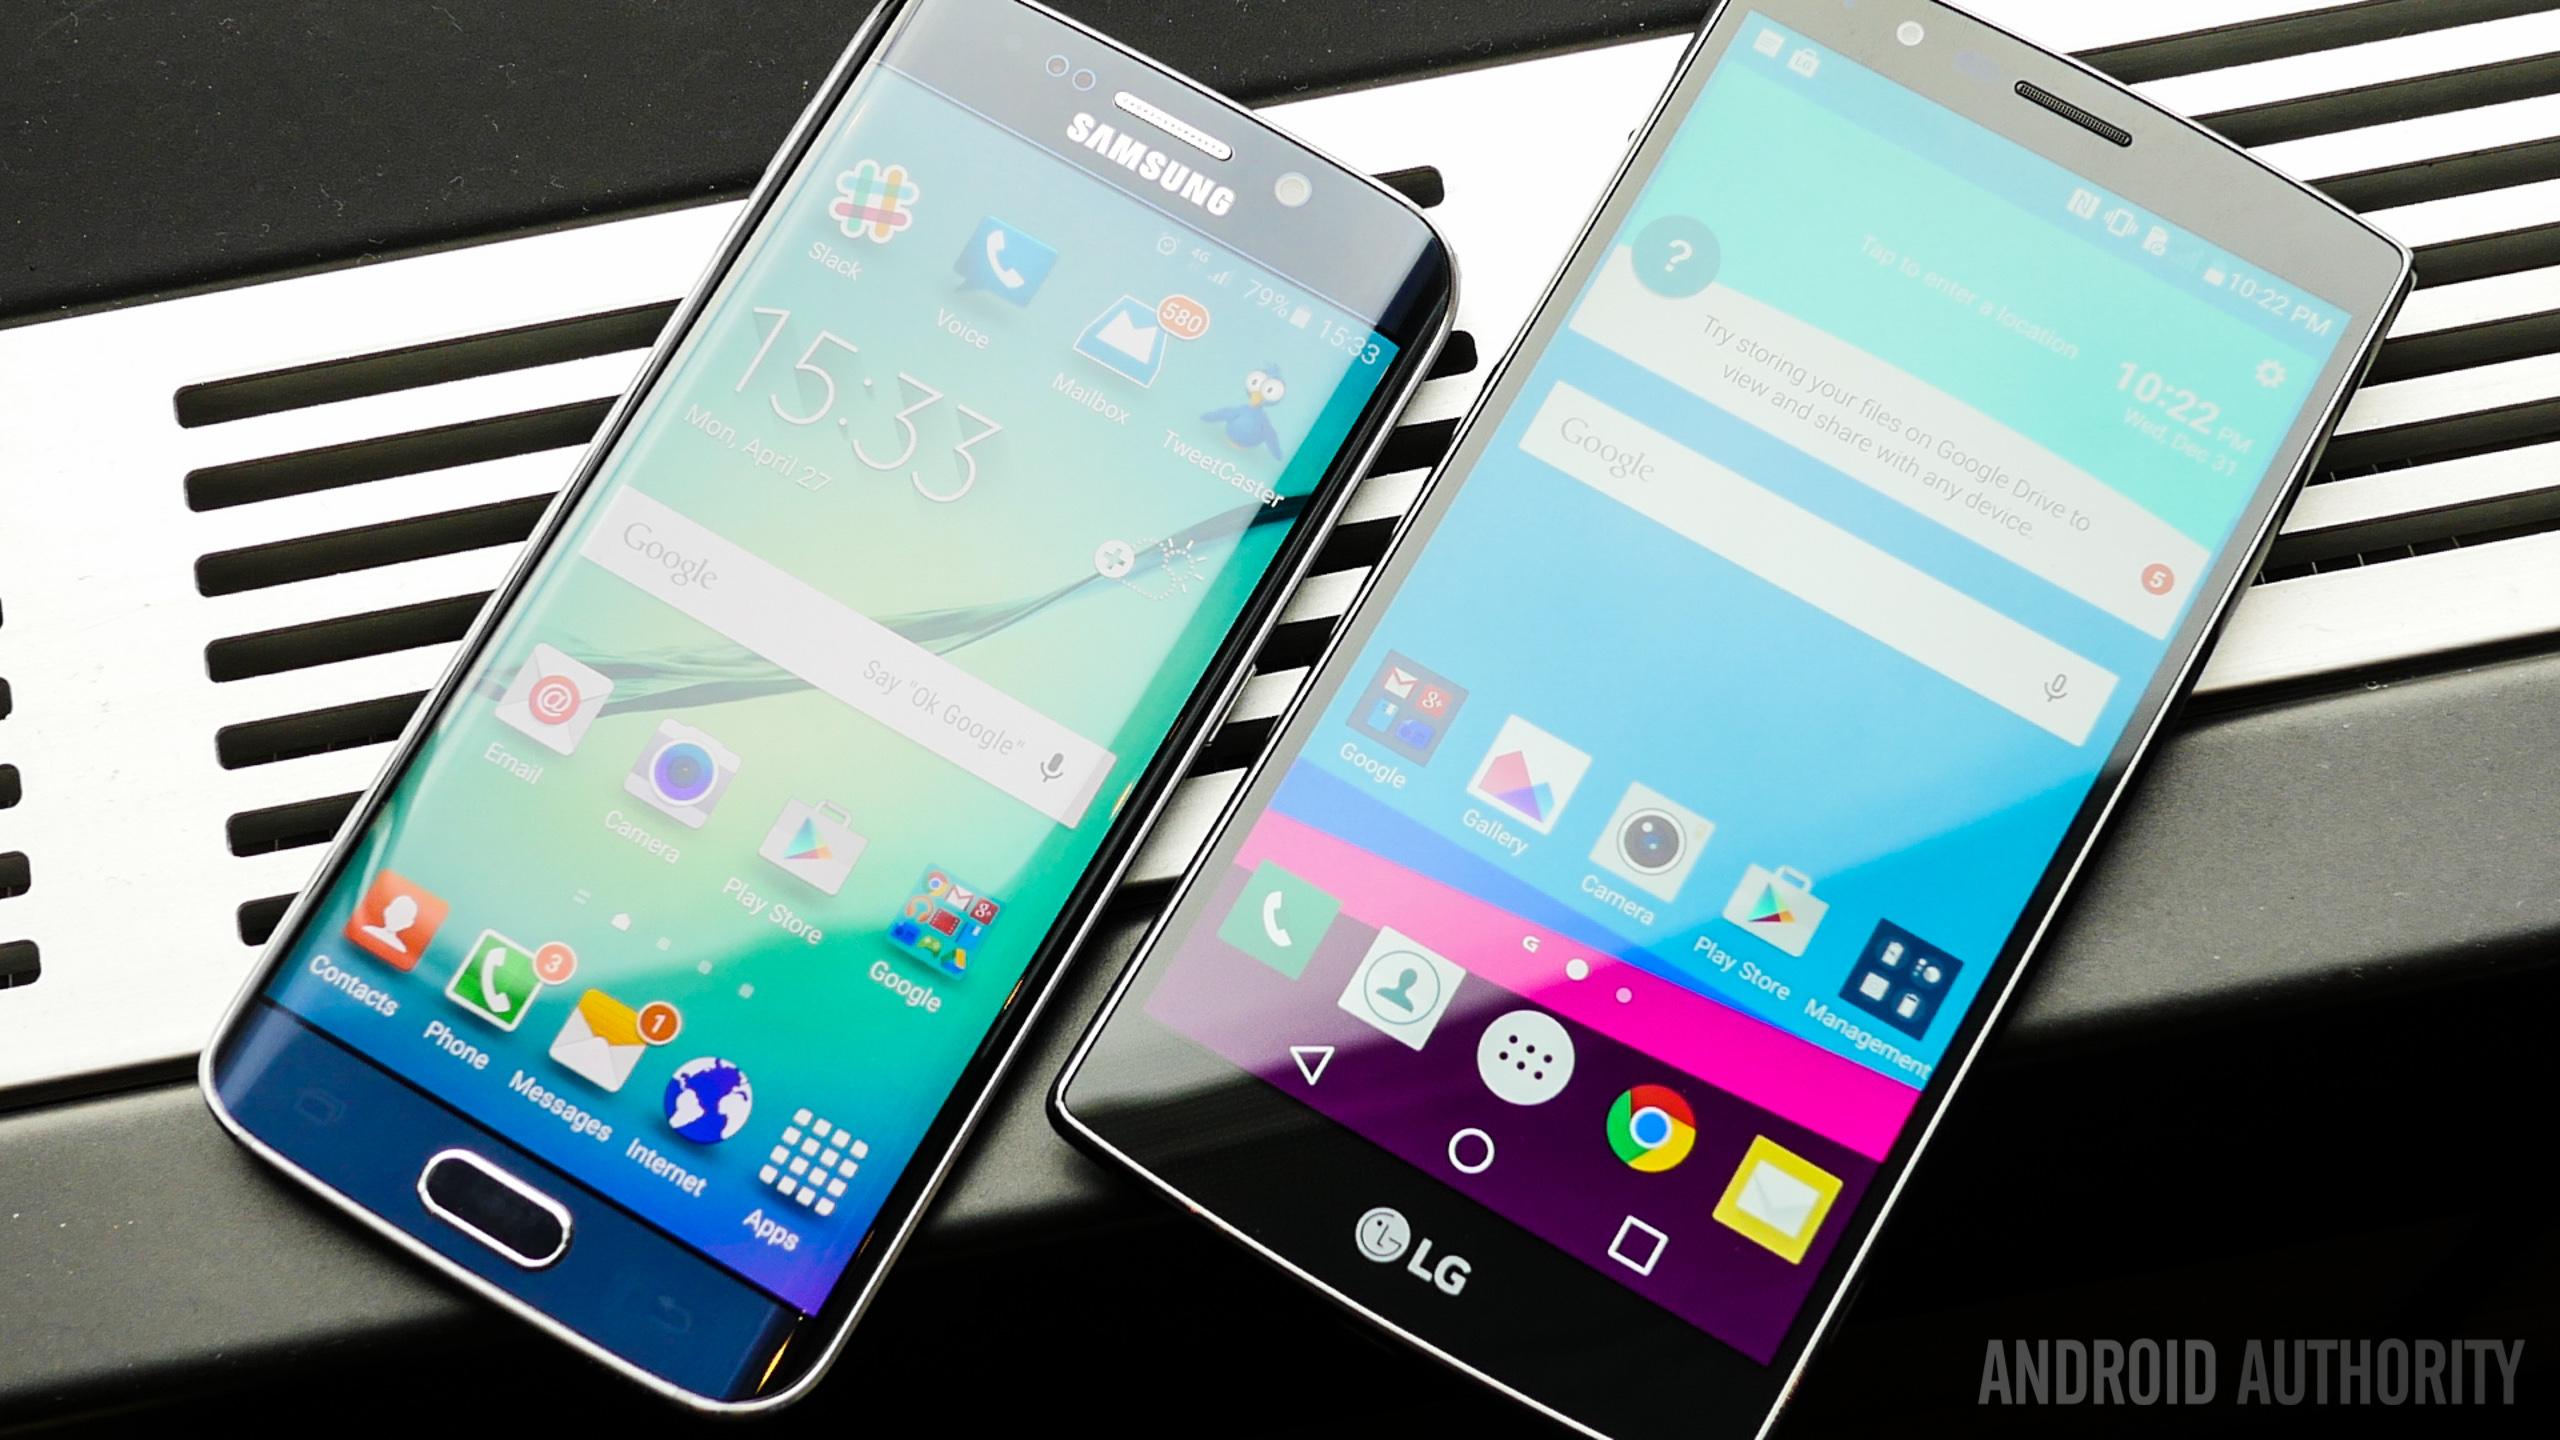 LG G4 Vs Samsung Galaxy S6 Edge Quick Look